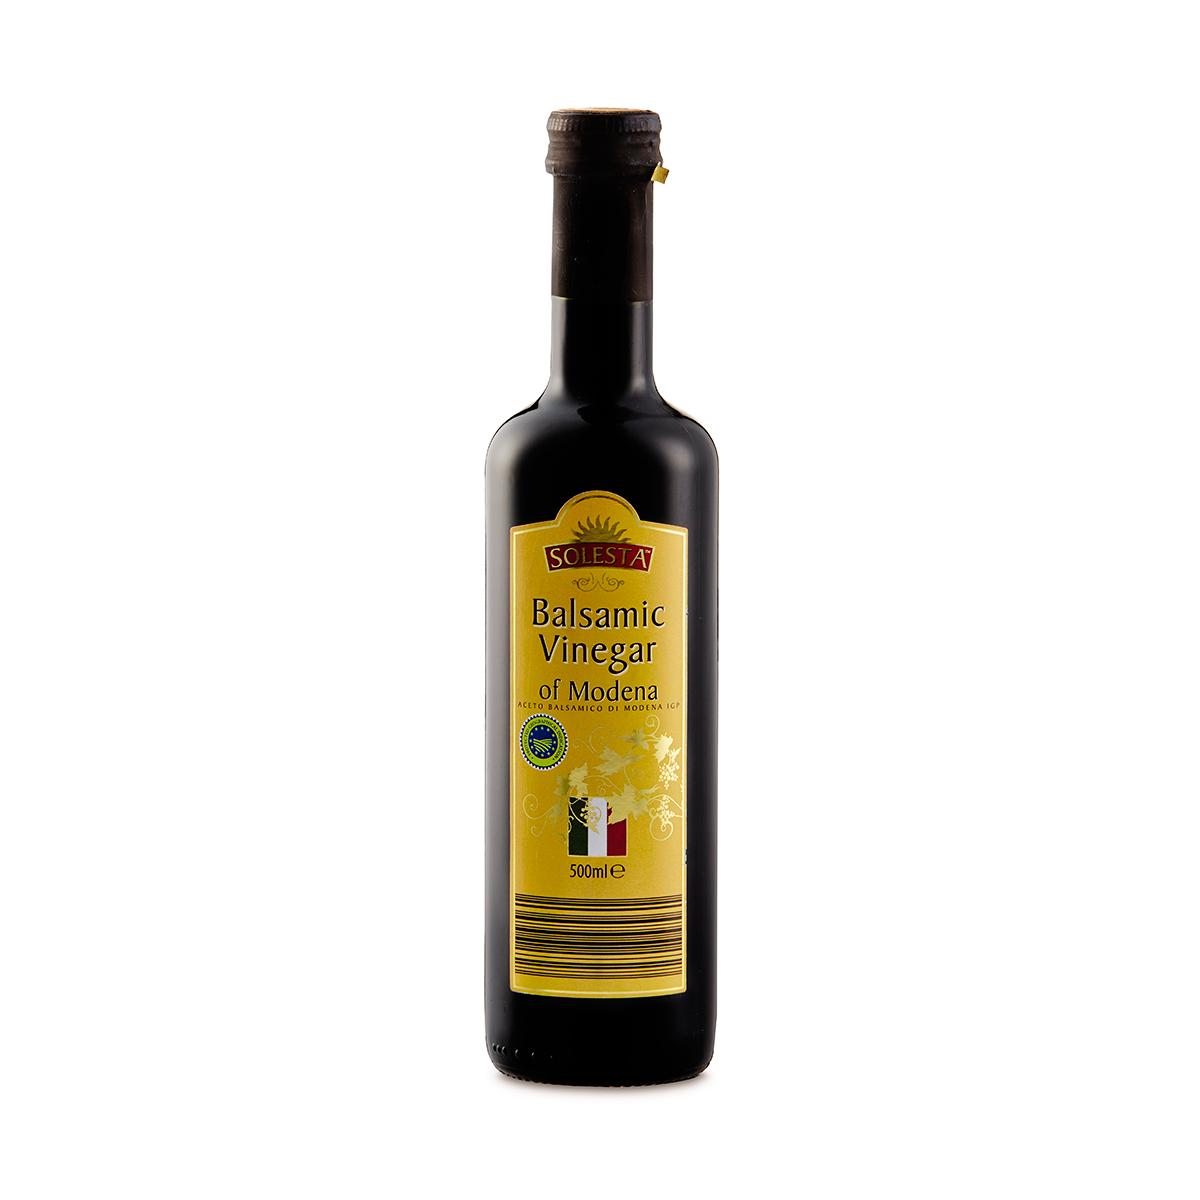 Balsamic vinegar - balsamic vinegar reviews - Good Housekeeping ...